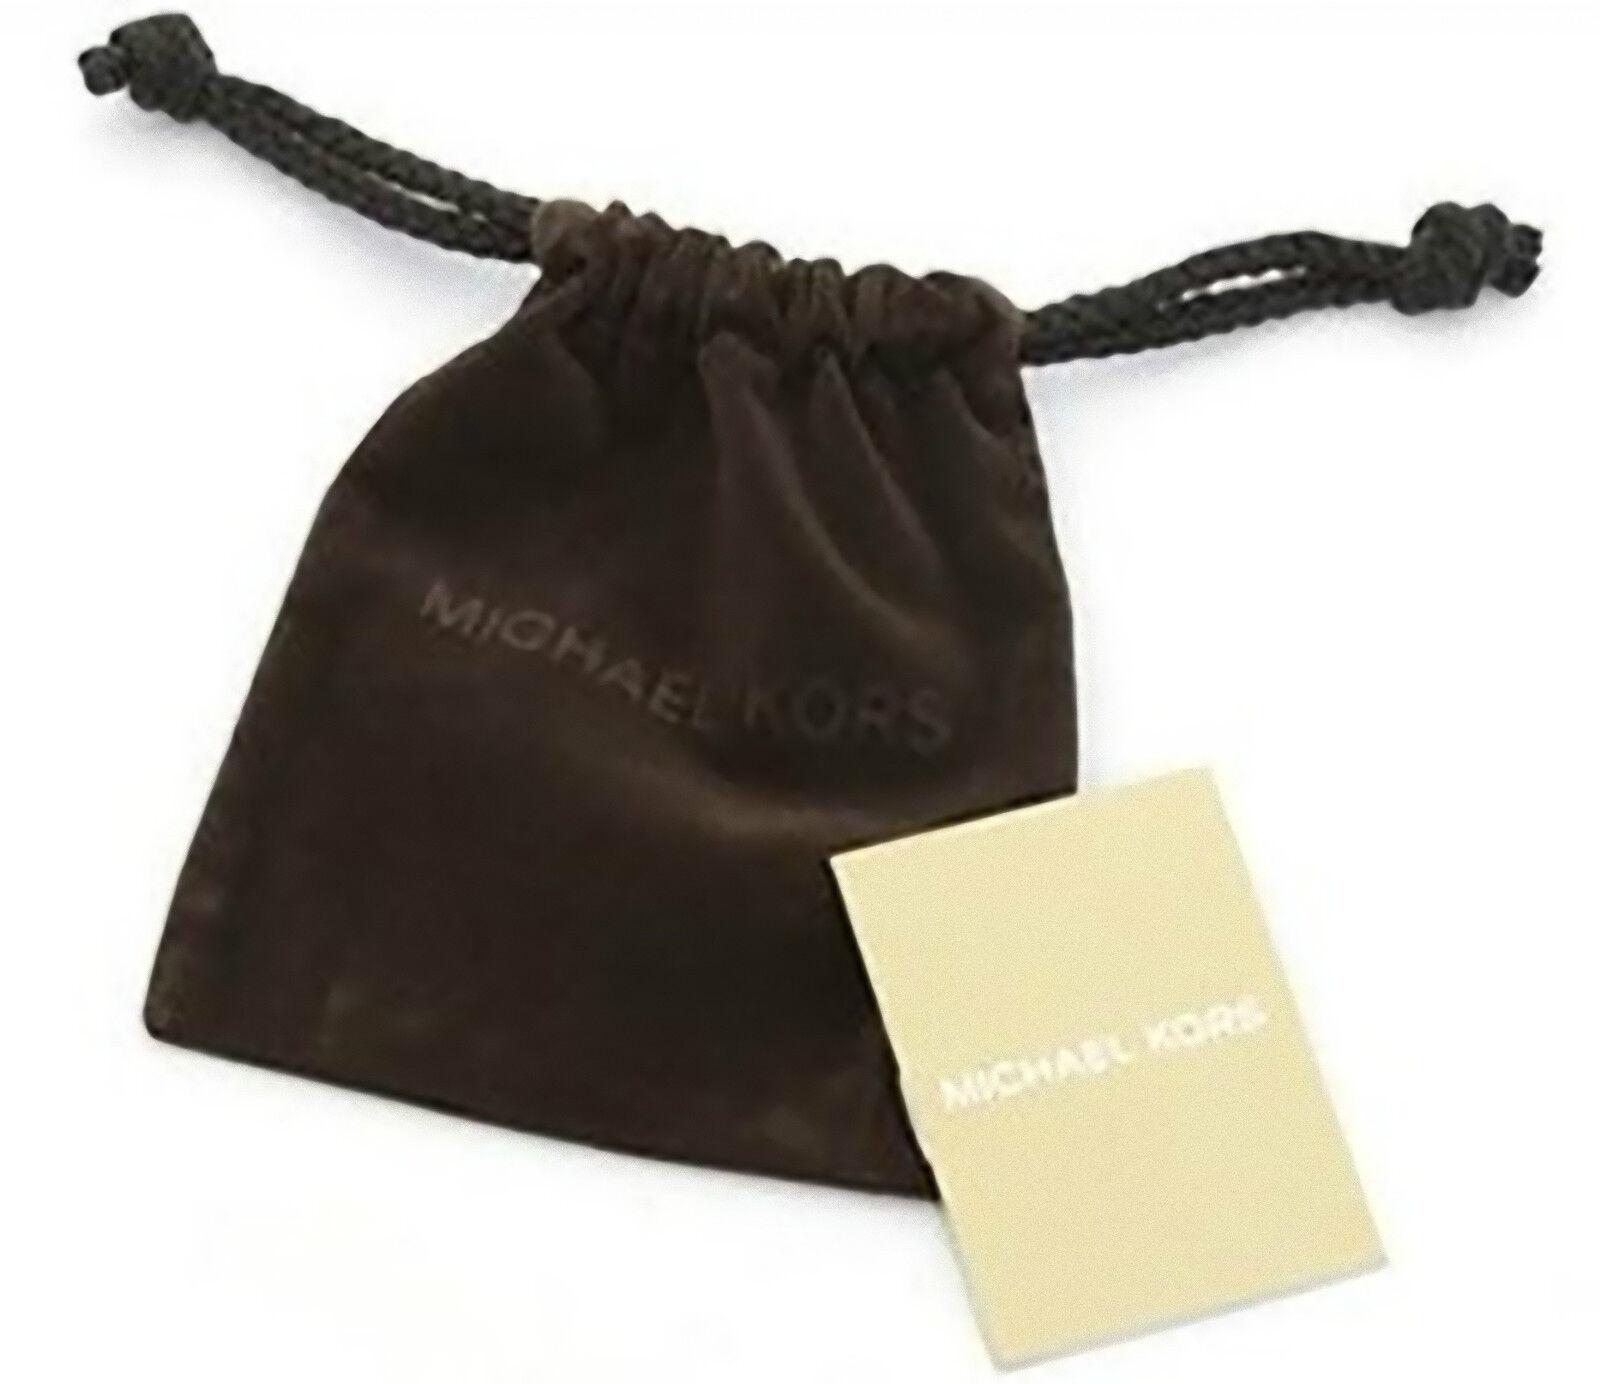 michael kors mkj5021 armreif armband farbe rose gold. Black Bedroom Furniture Sets. Home Design Ideas